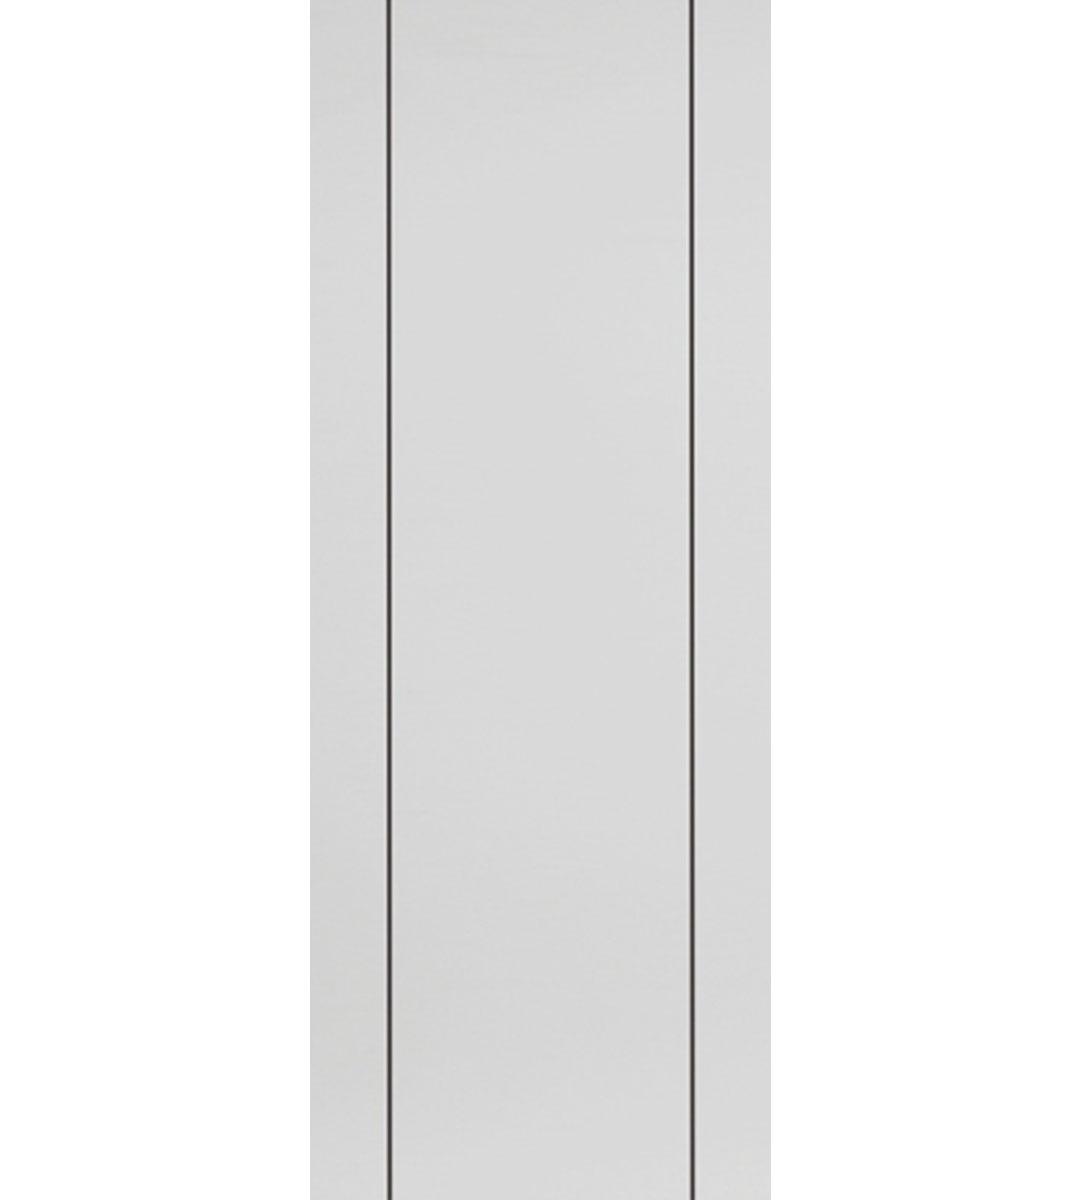 eco parelo white internal door